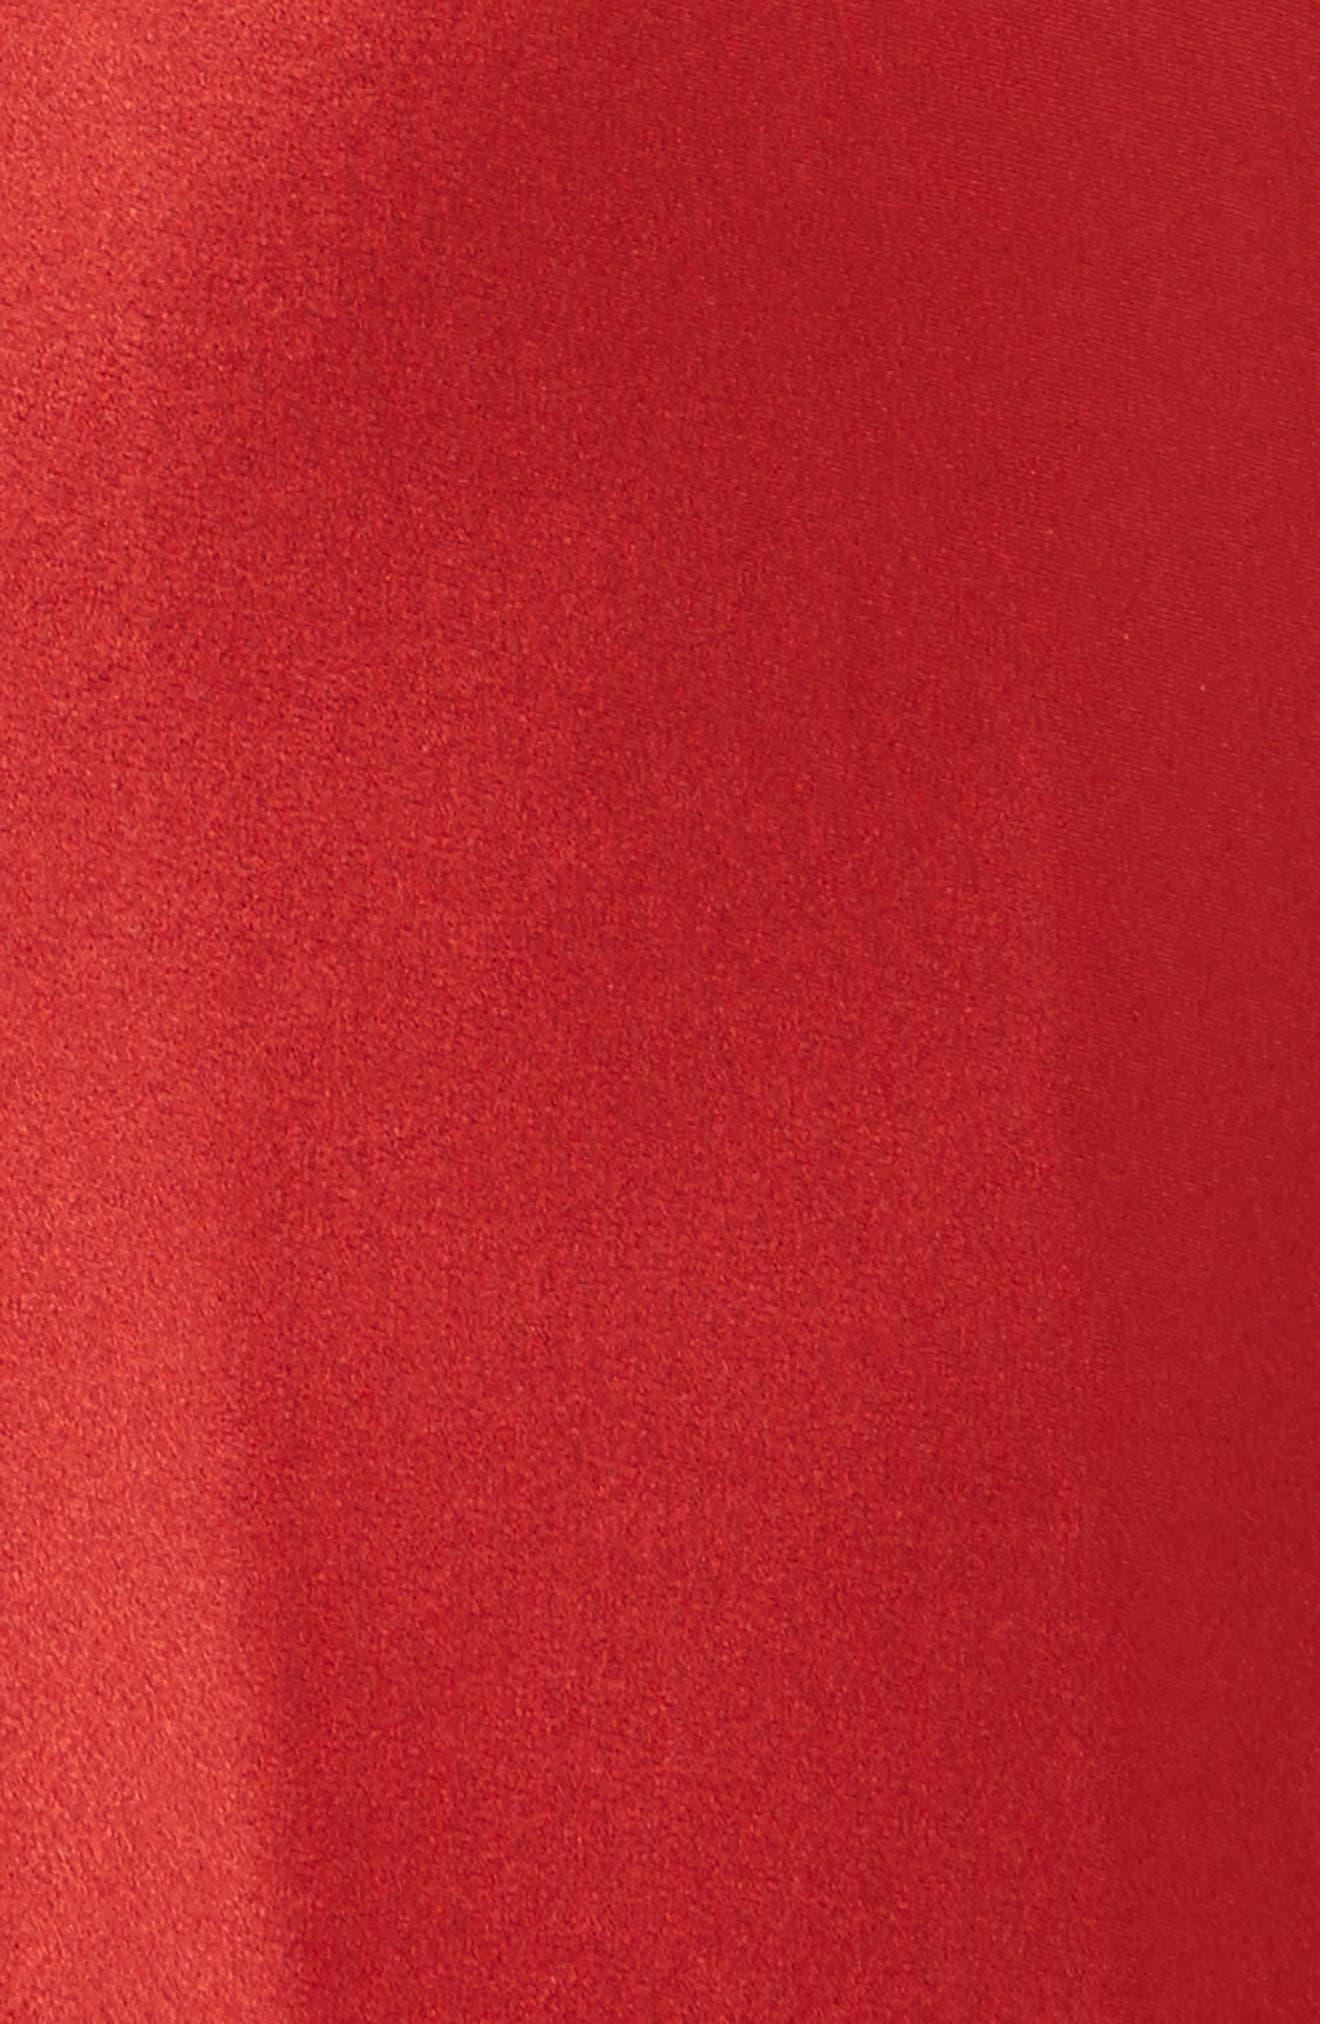 T by Alexander Wang Draped Satin Dress,                             Alternate thumbnail 6, color,                             610